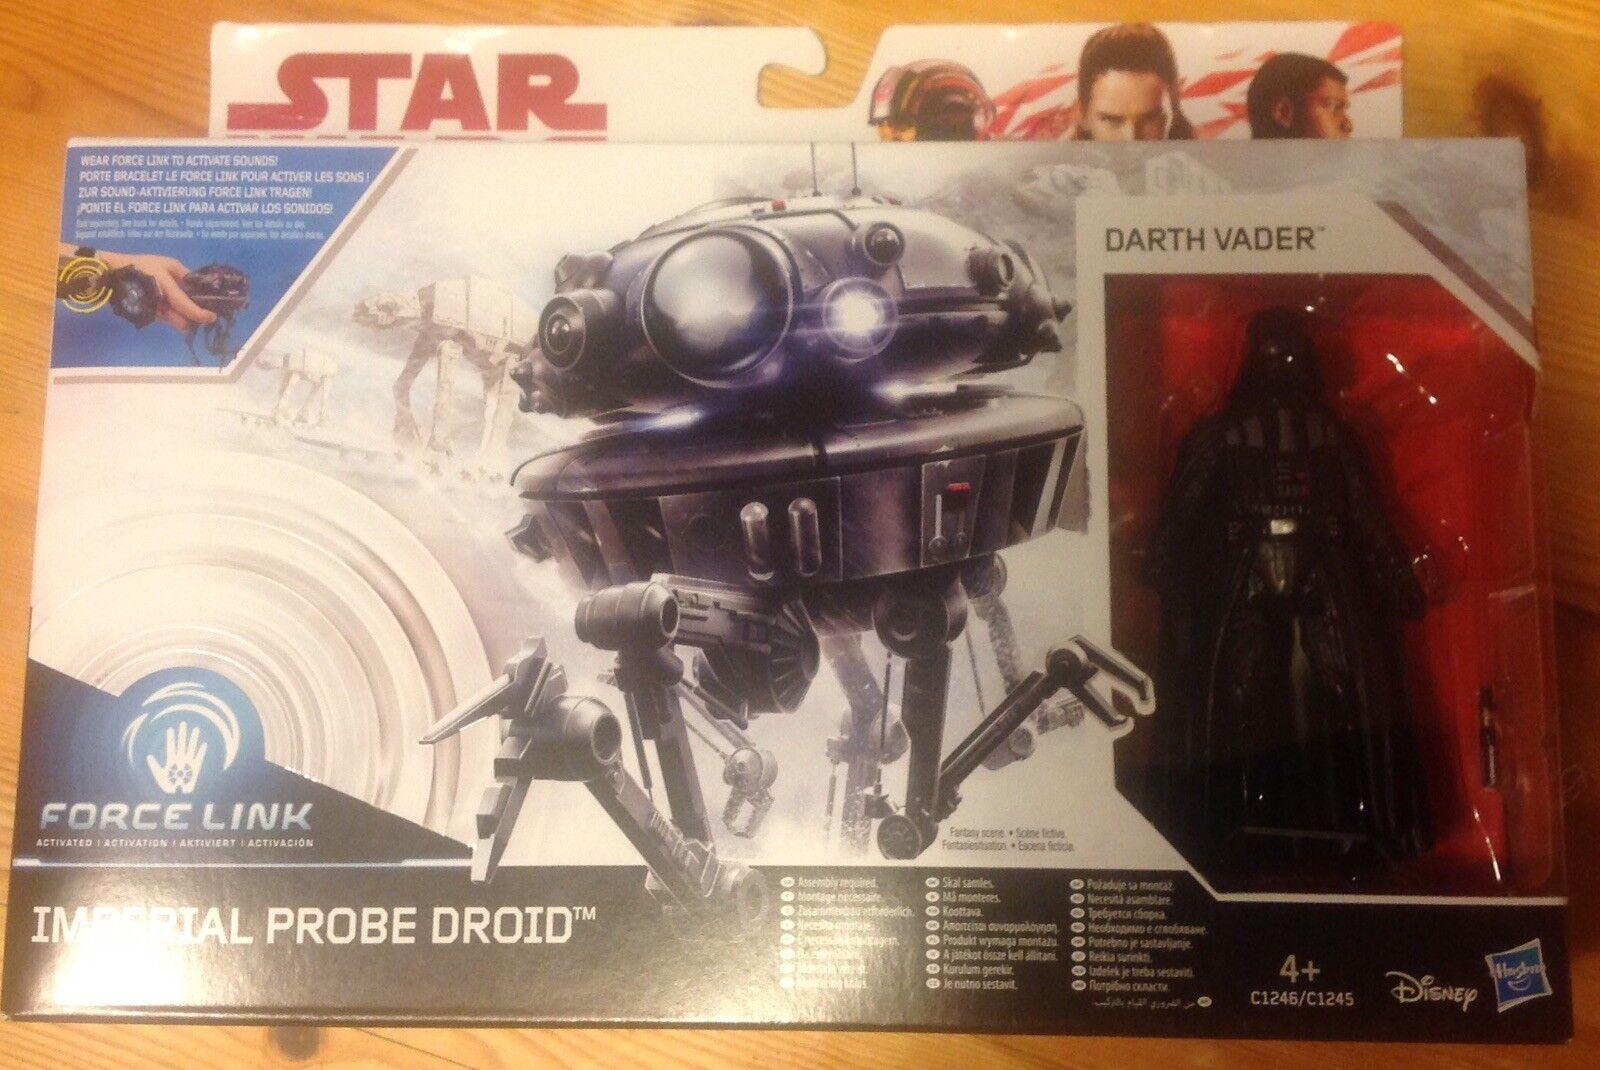 Imperial Probe Probe Probe Droid & Darth Vader Star Wars Force Link Figure BNIB 0d7c42